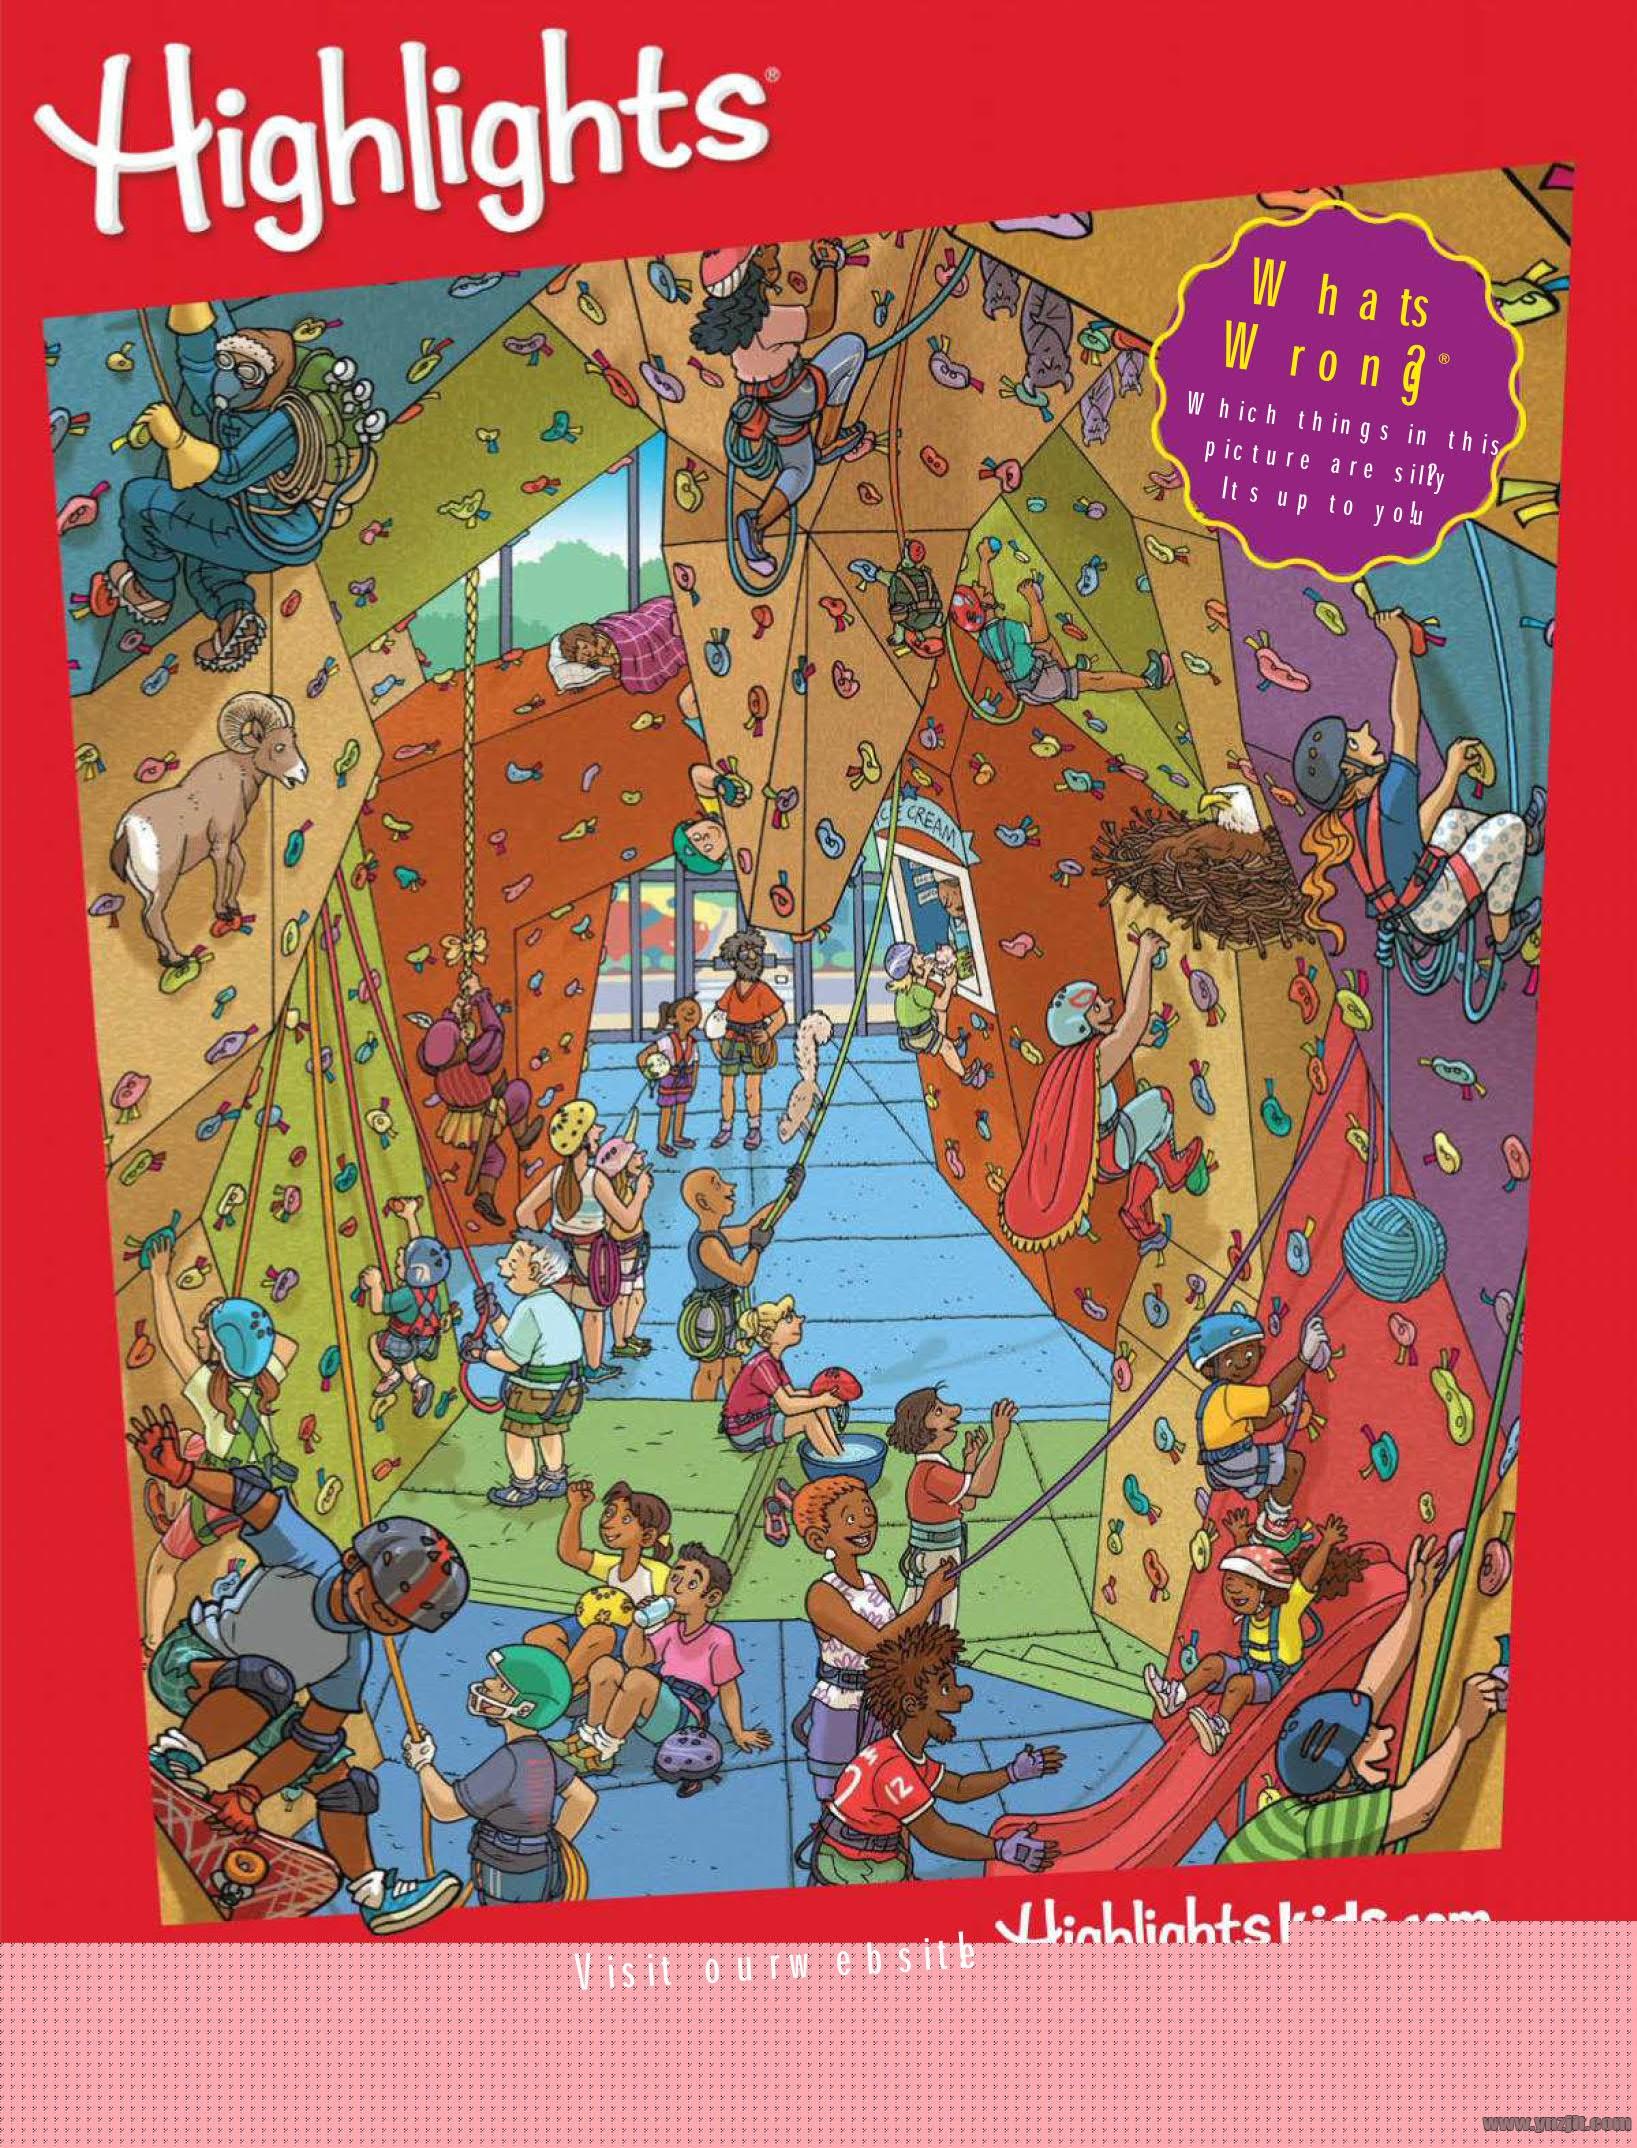 Highlights儿童英语杂志2.jpg